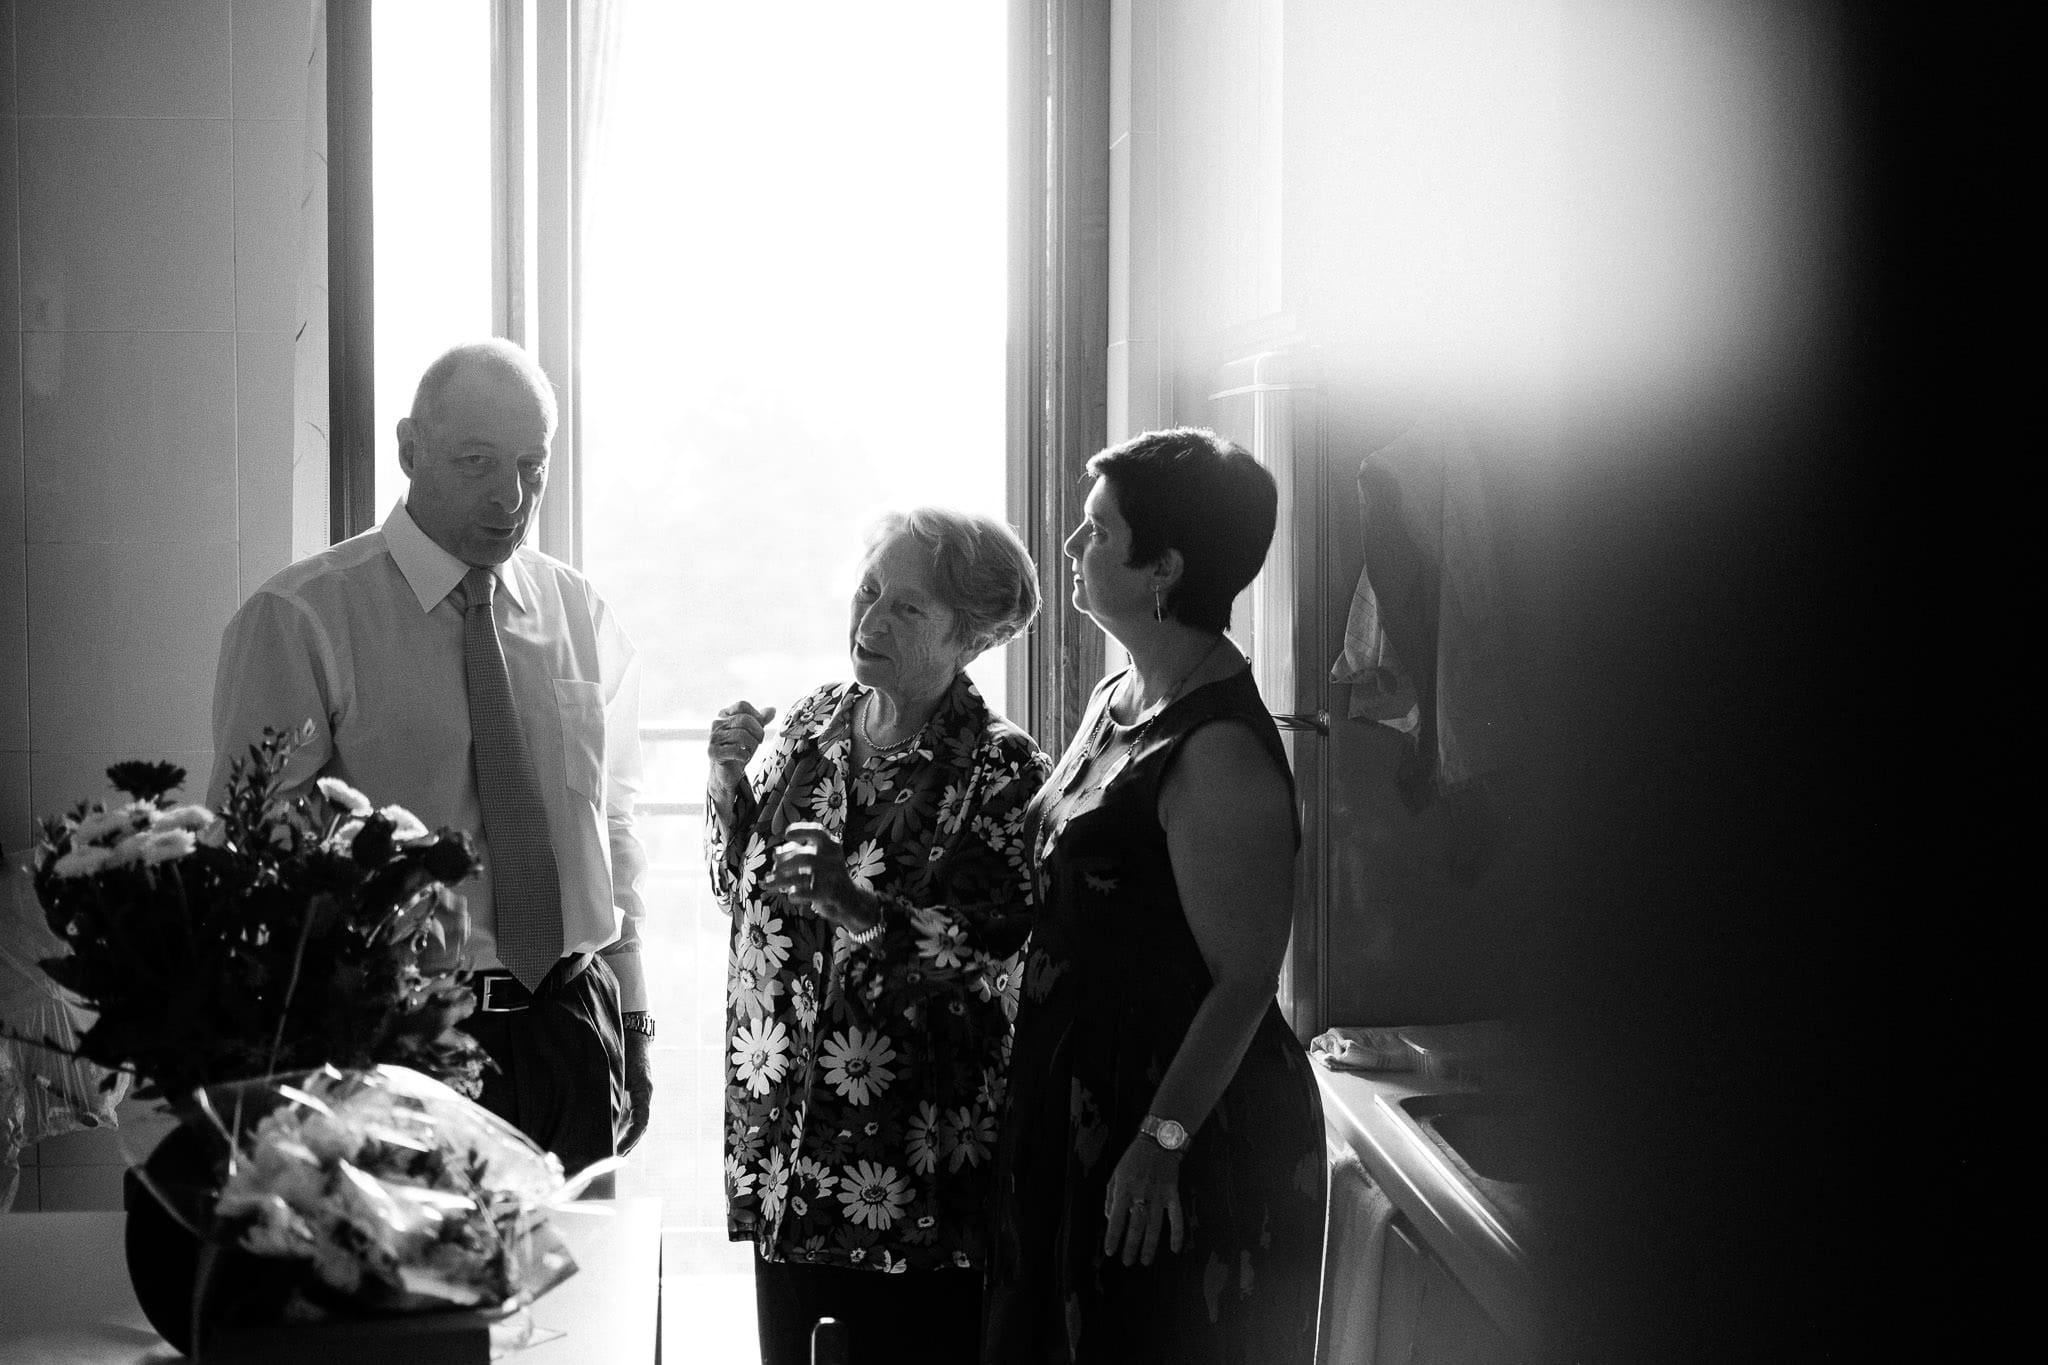 fotografo matrimonio cascina diodona varese lucarossifoto 00002